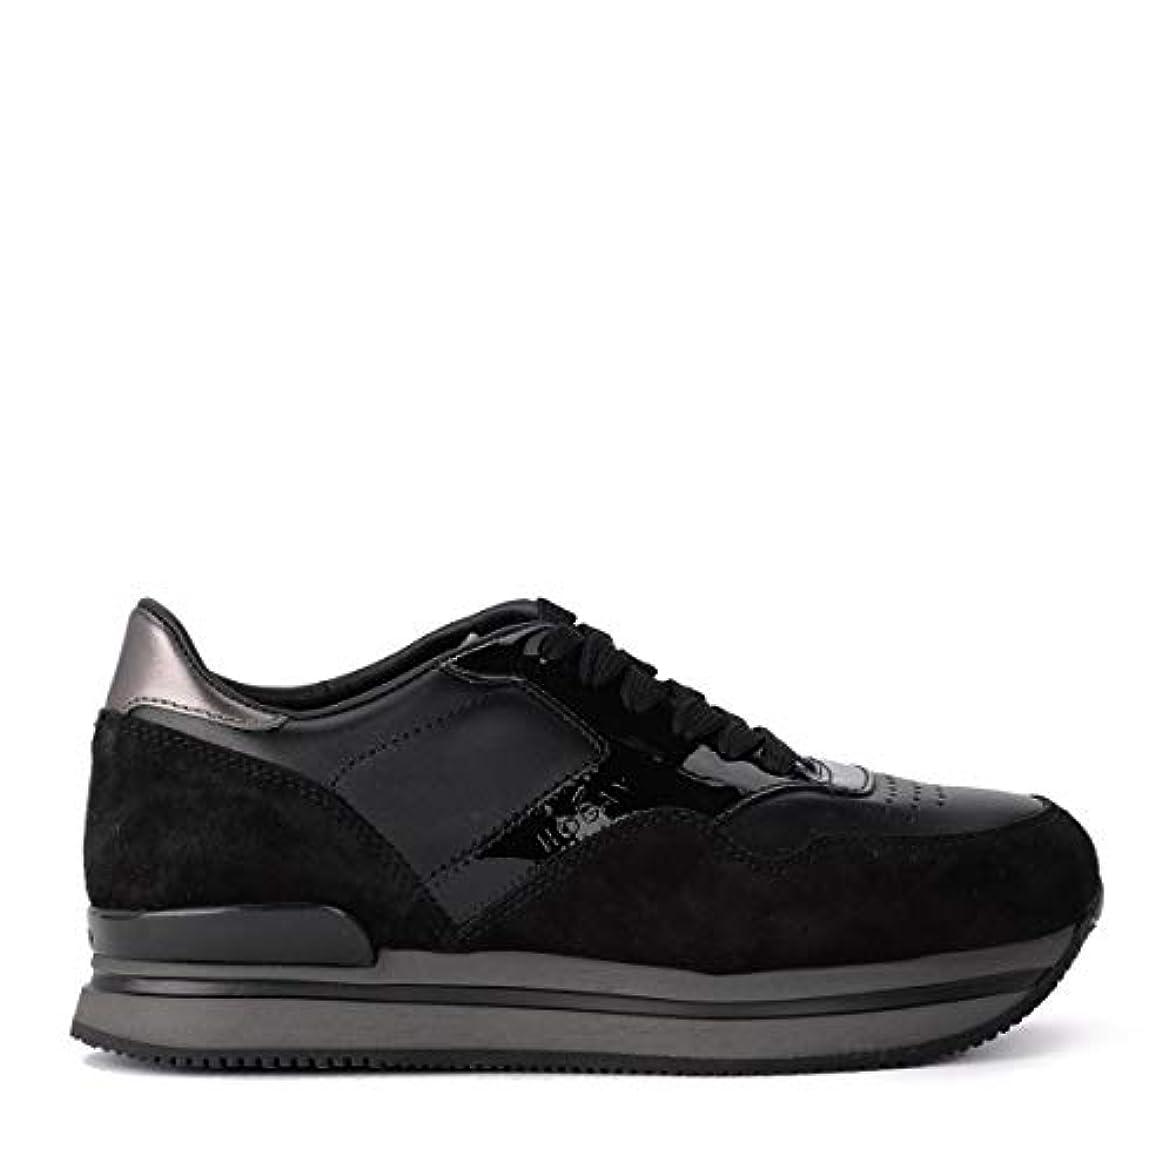 Hogan Sneaker H222 Nere In Pelle E Suede Taglia Uk